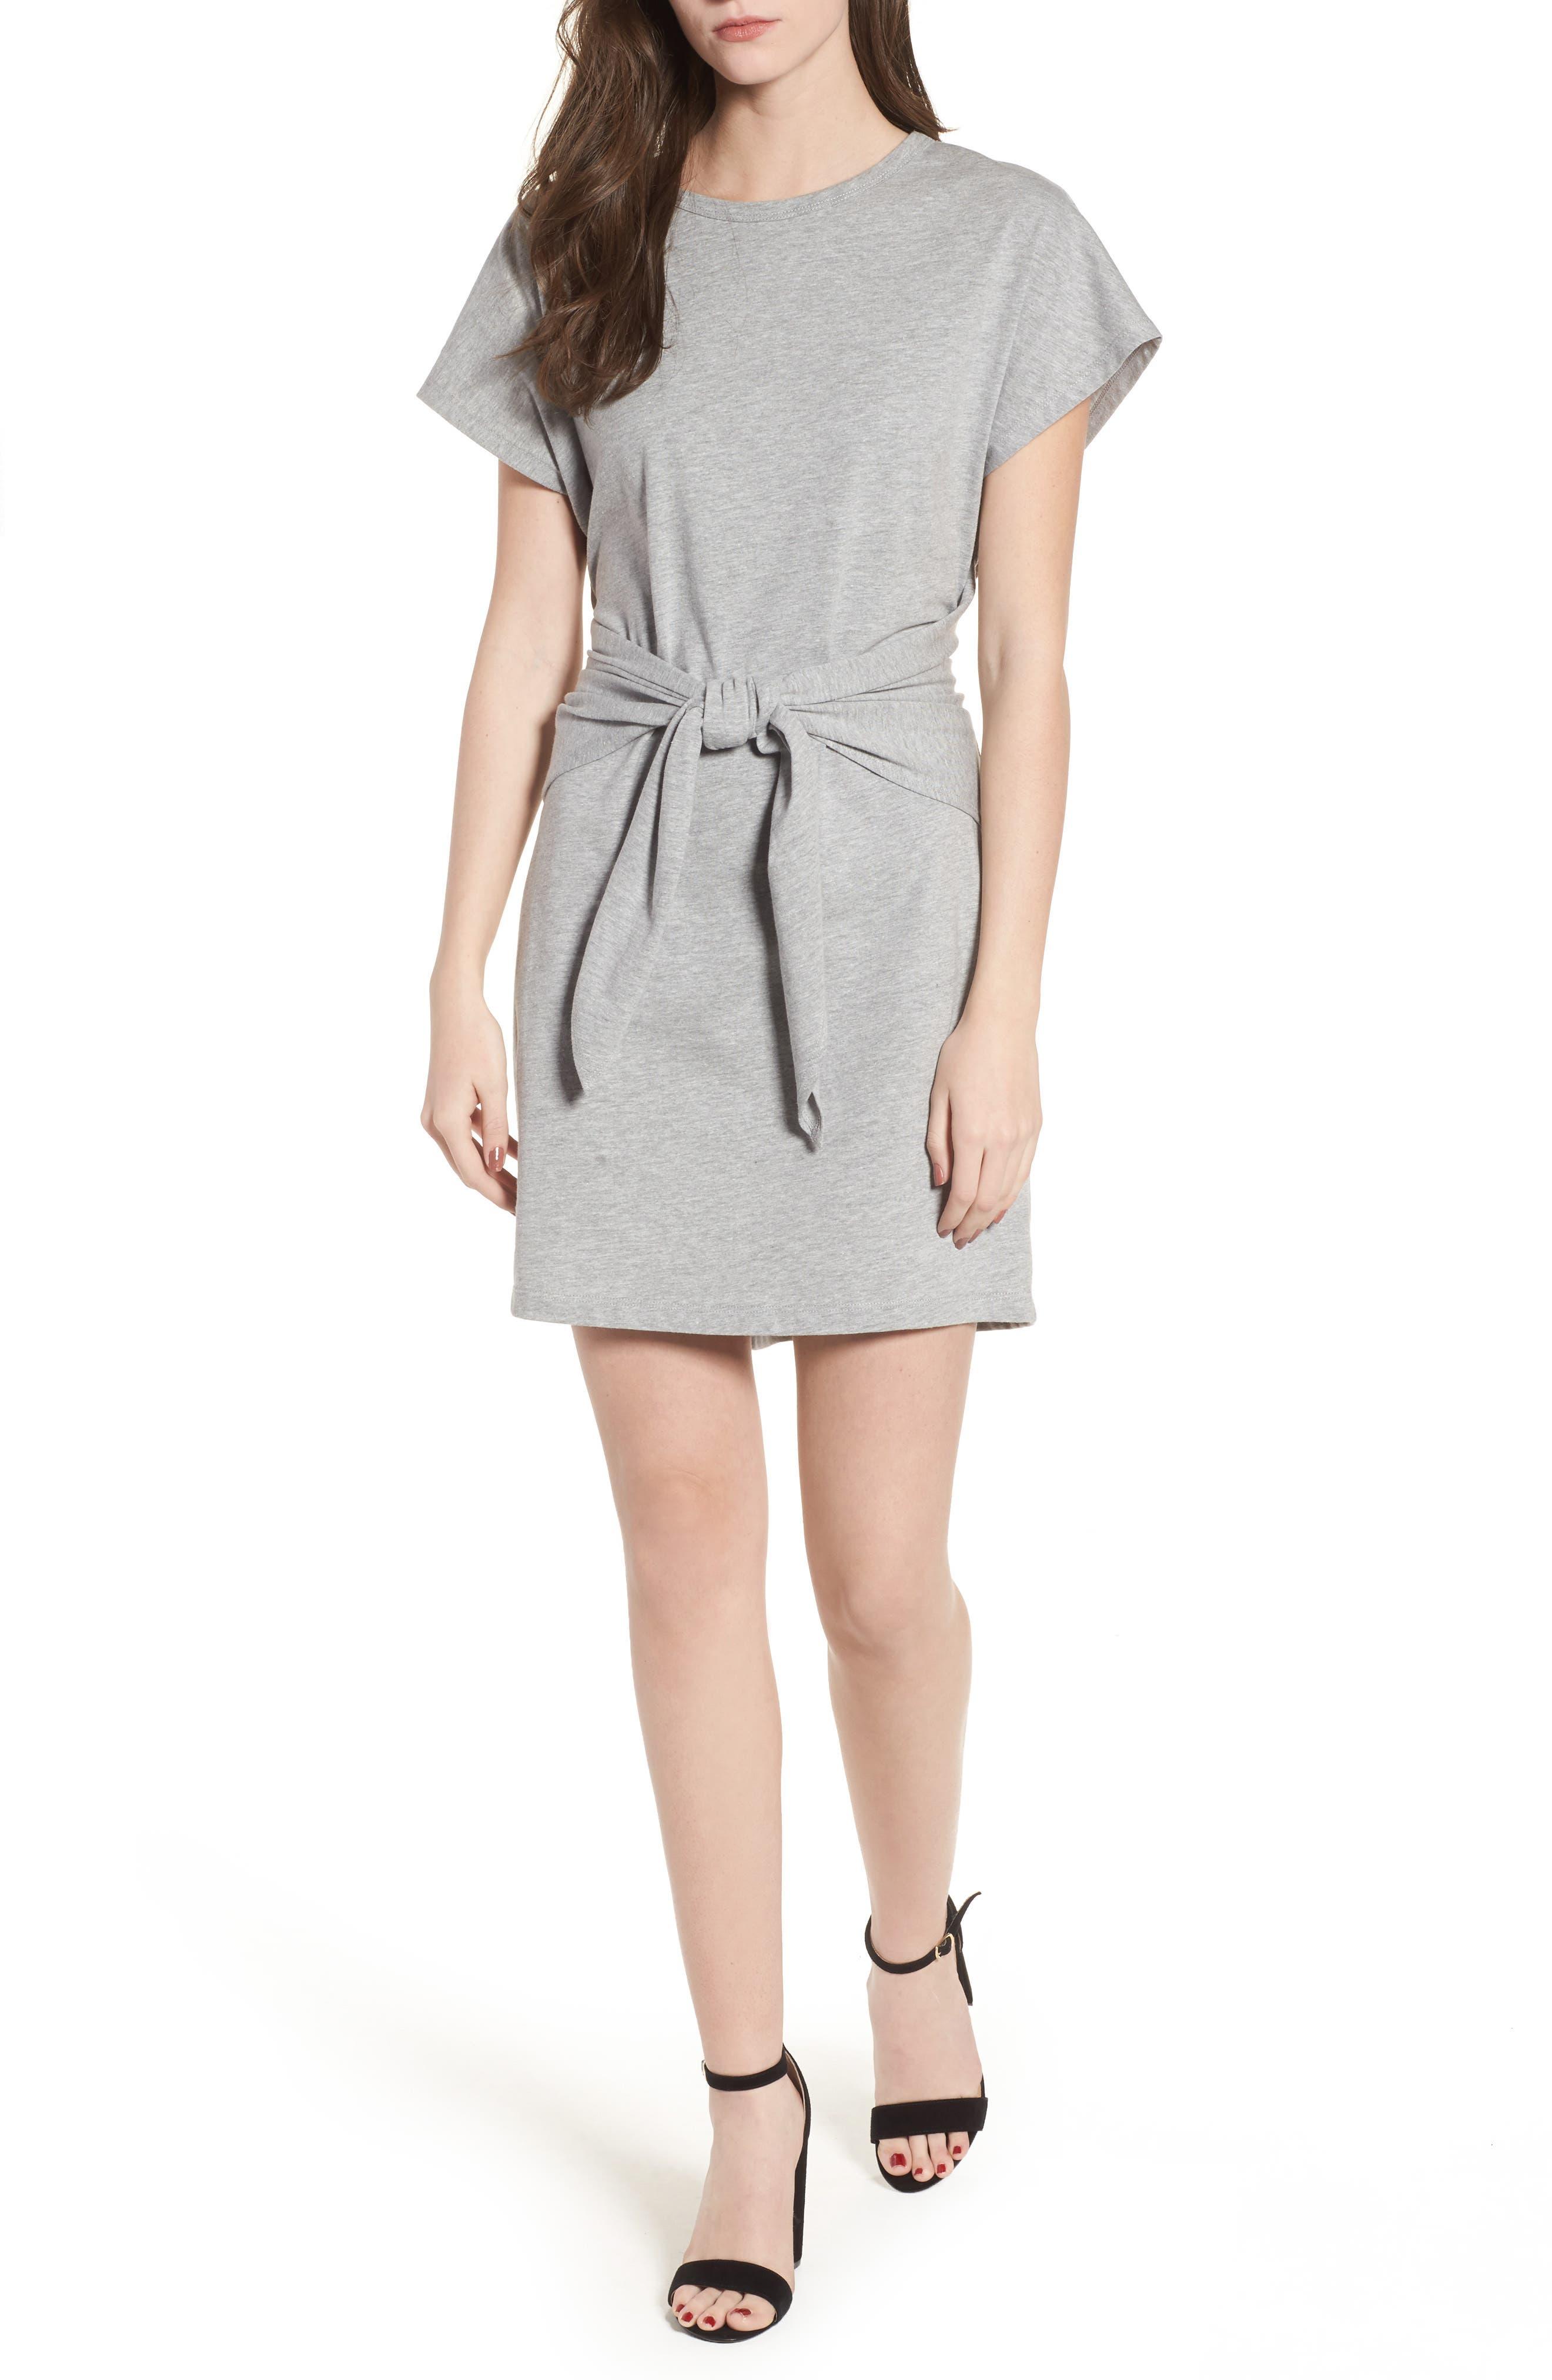 Grey t shirt dress h&m